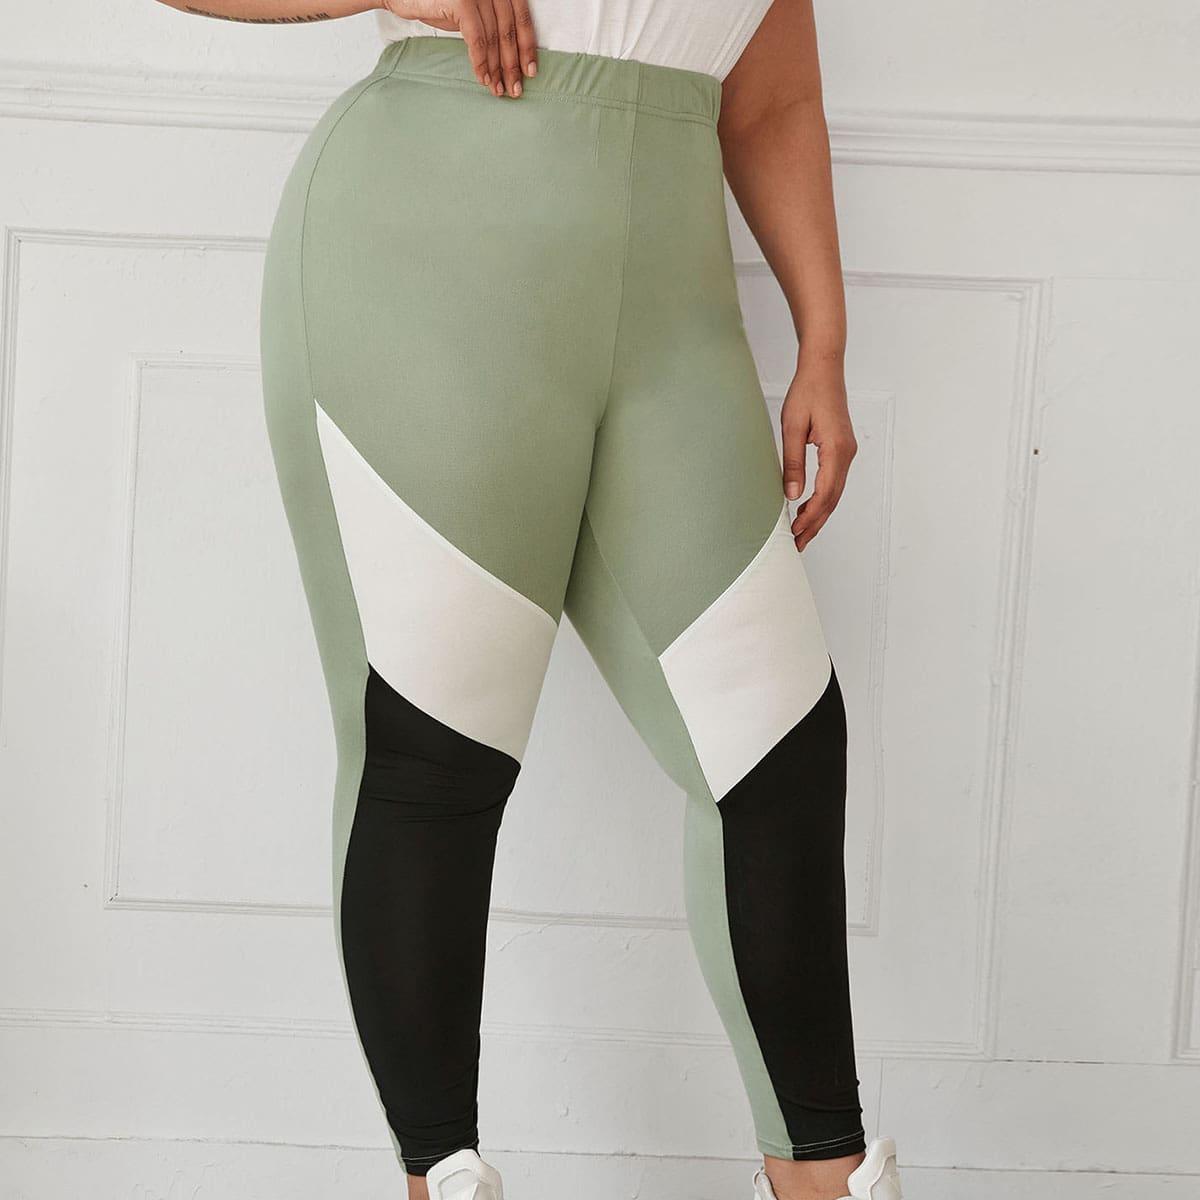 SHEIN Sport Kleurblok Grote maat: legging